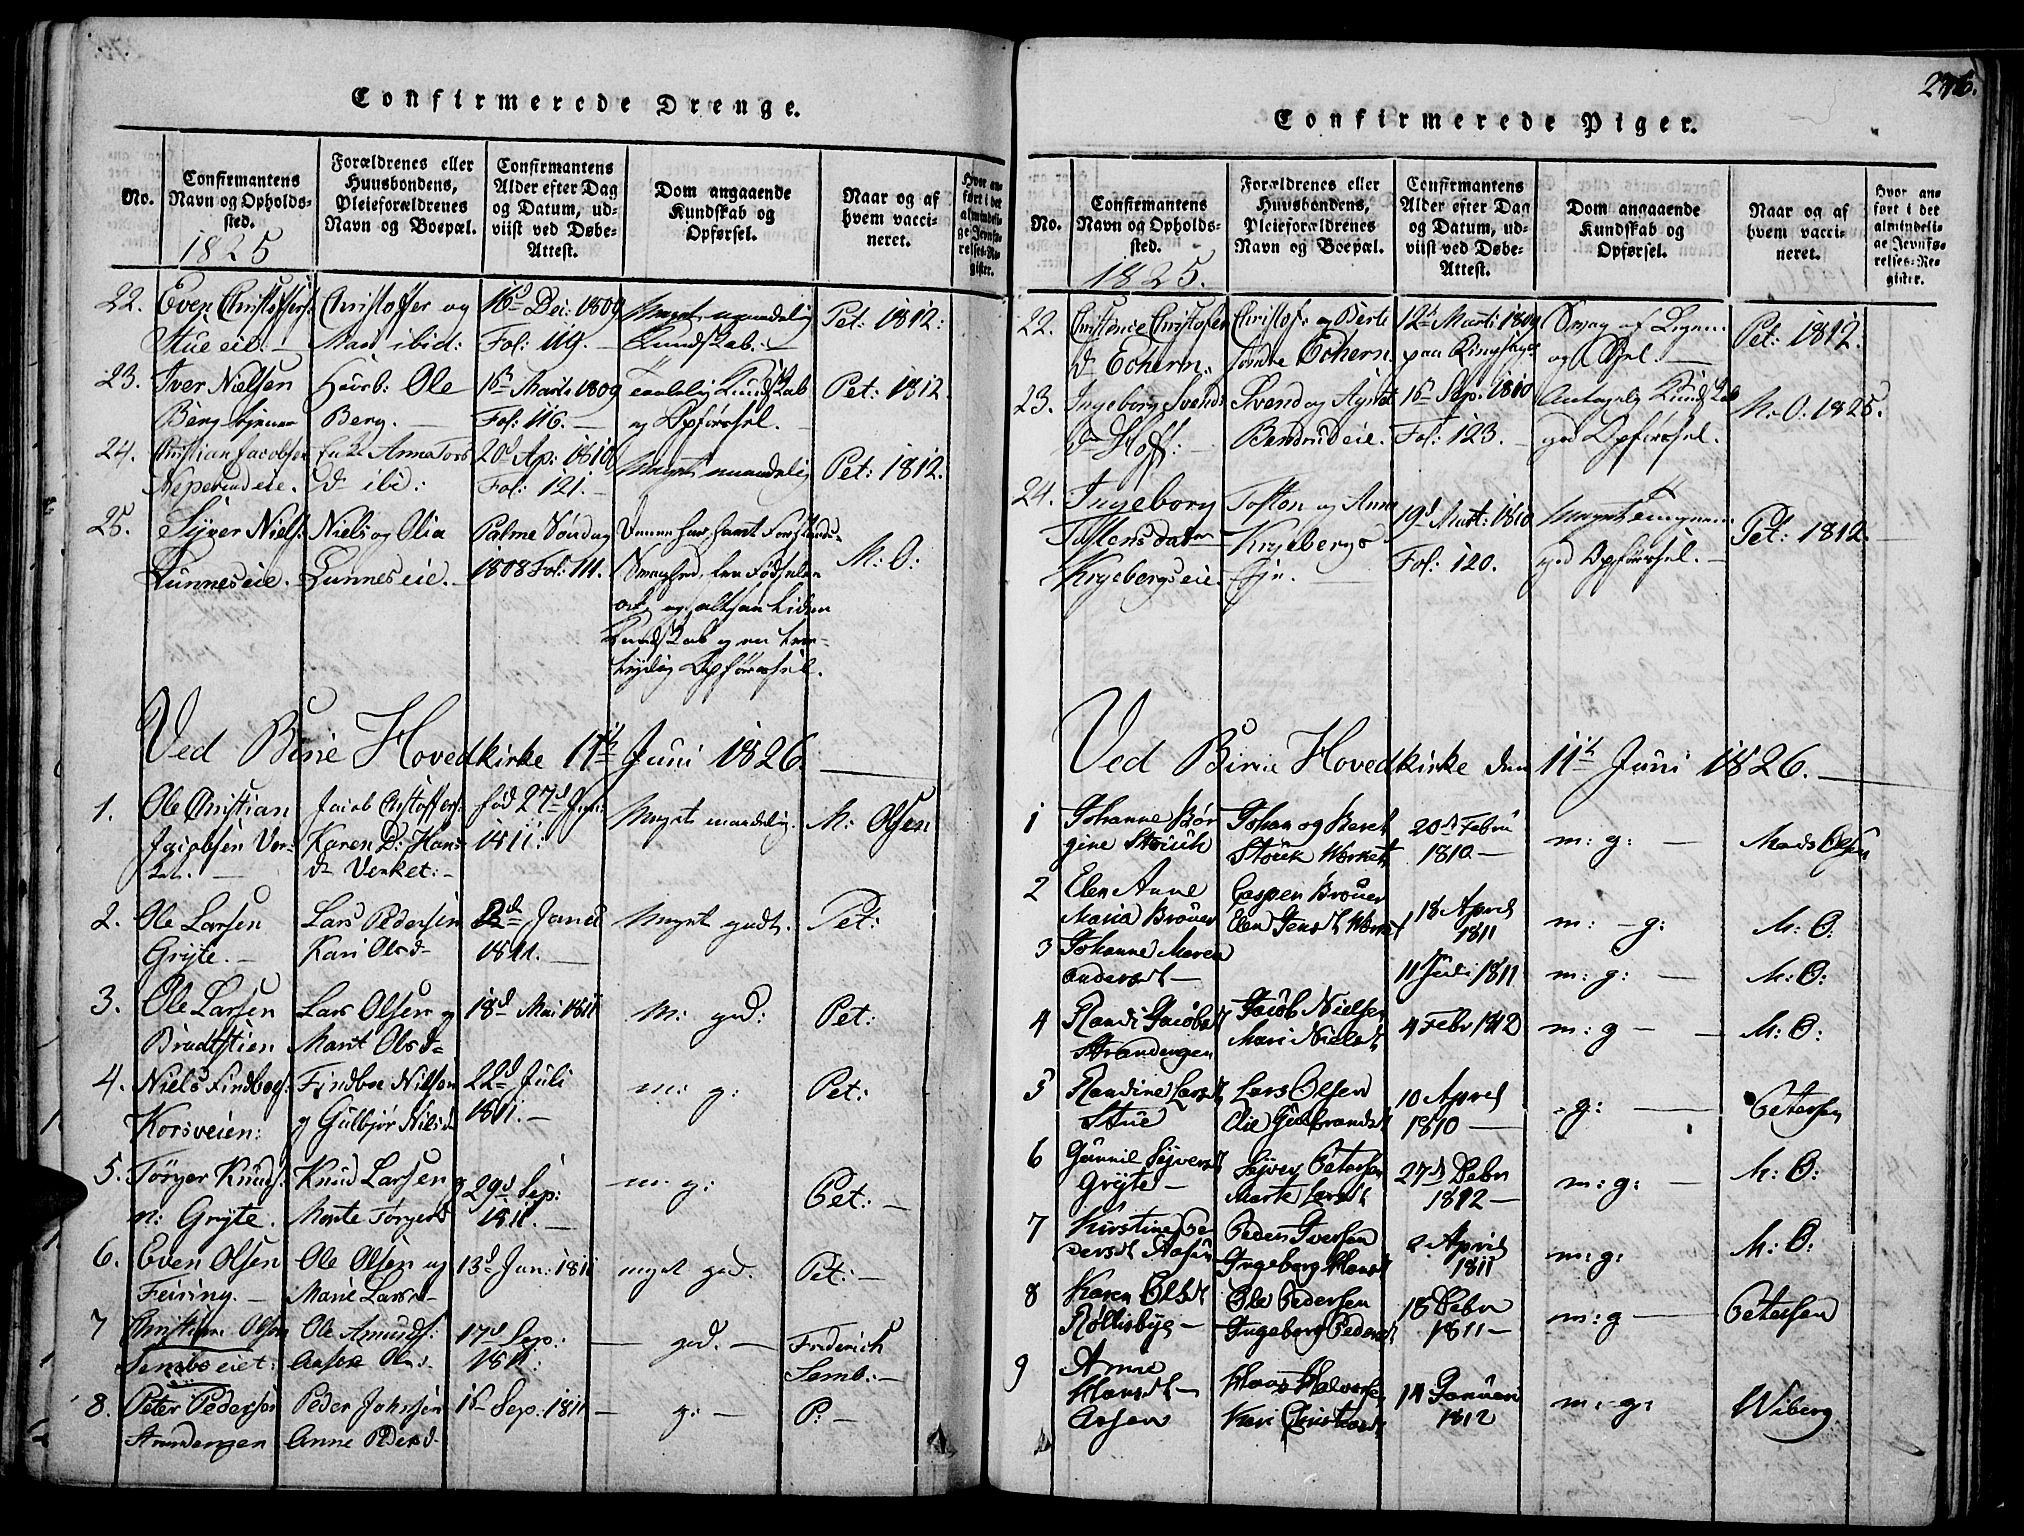 SAH, Biri prestekontor, Ministerialbok nr. 3, 1814-1828, s. 276